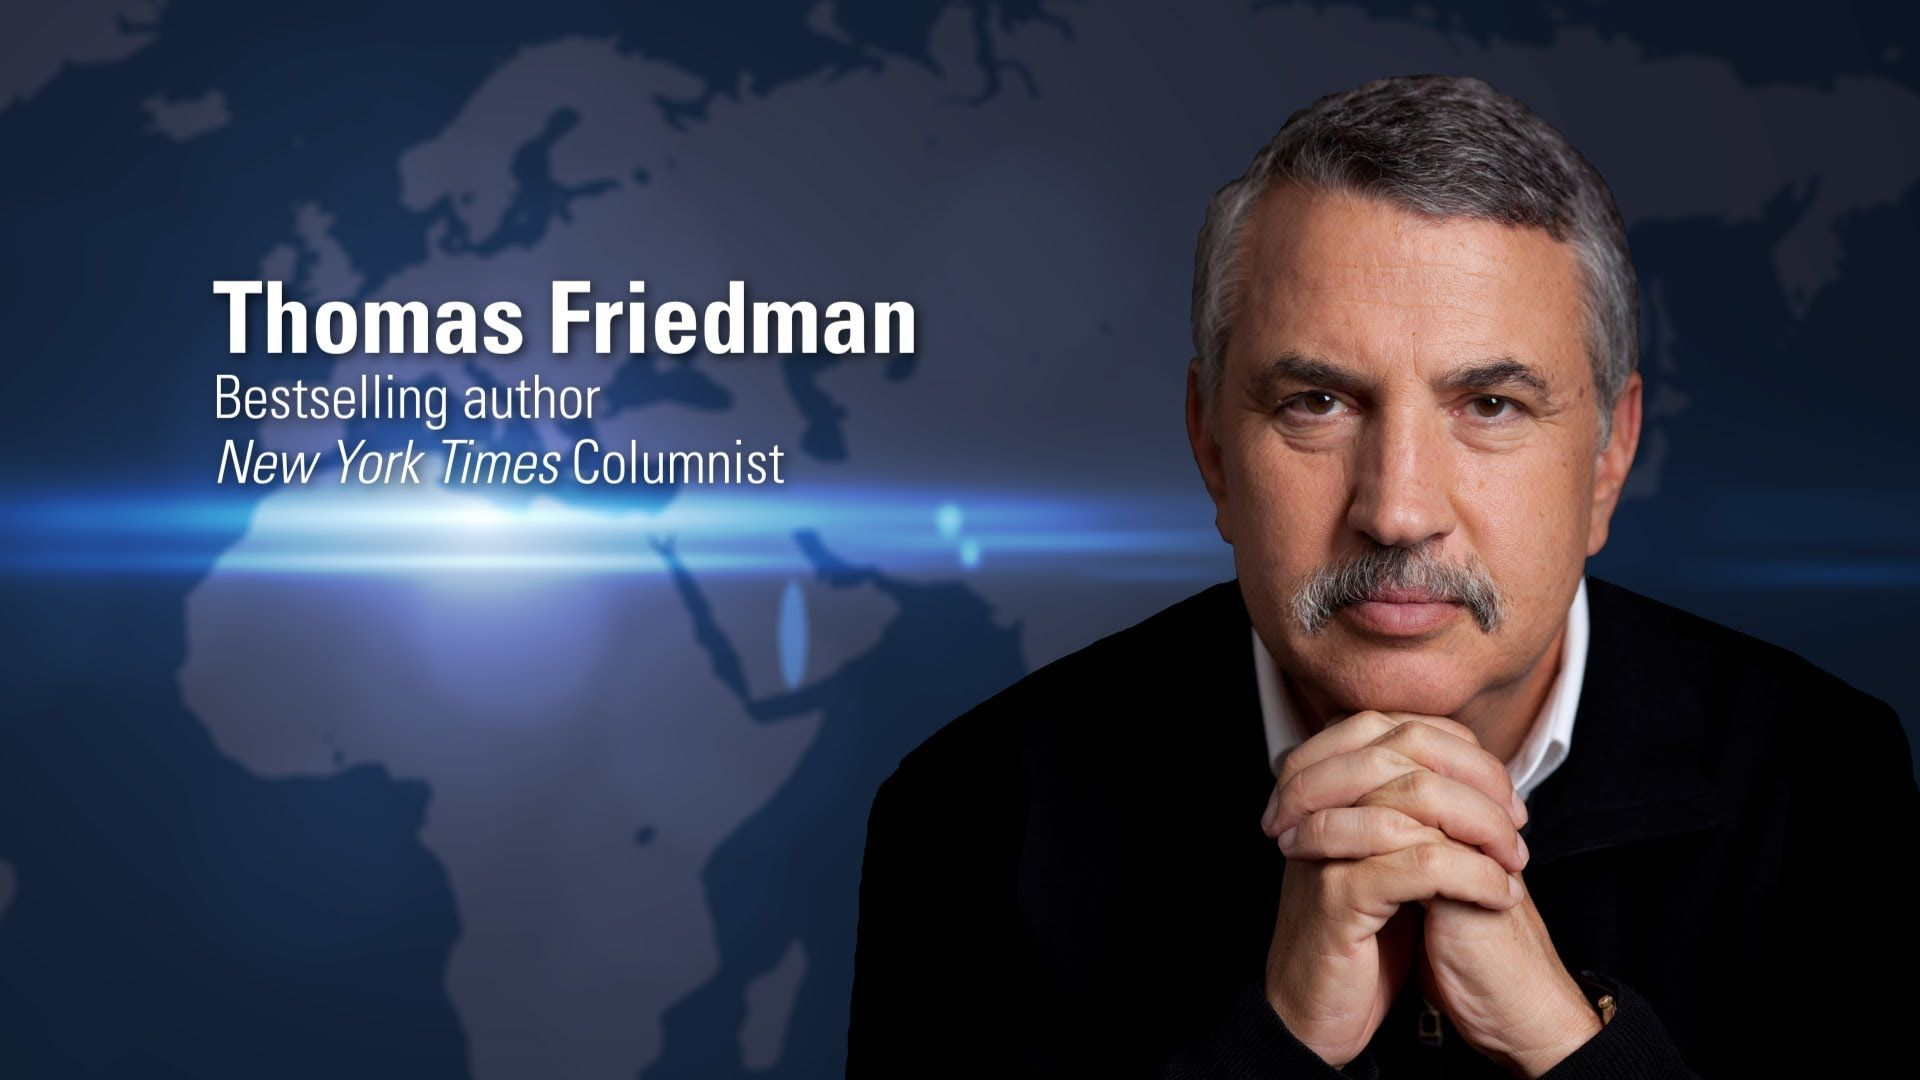 11. Thomas Friedman